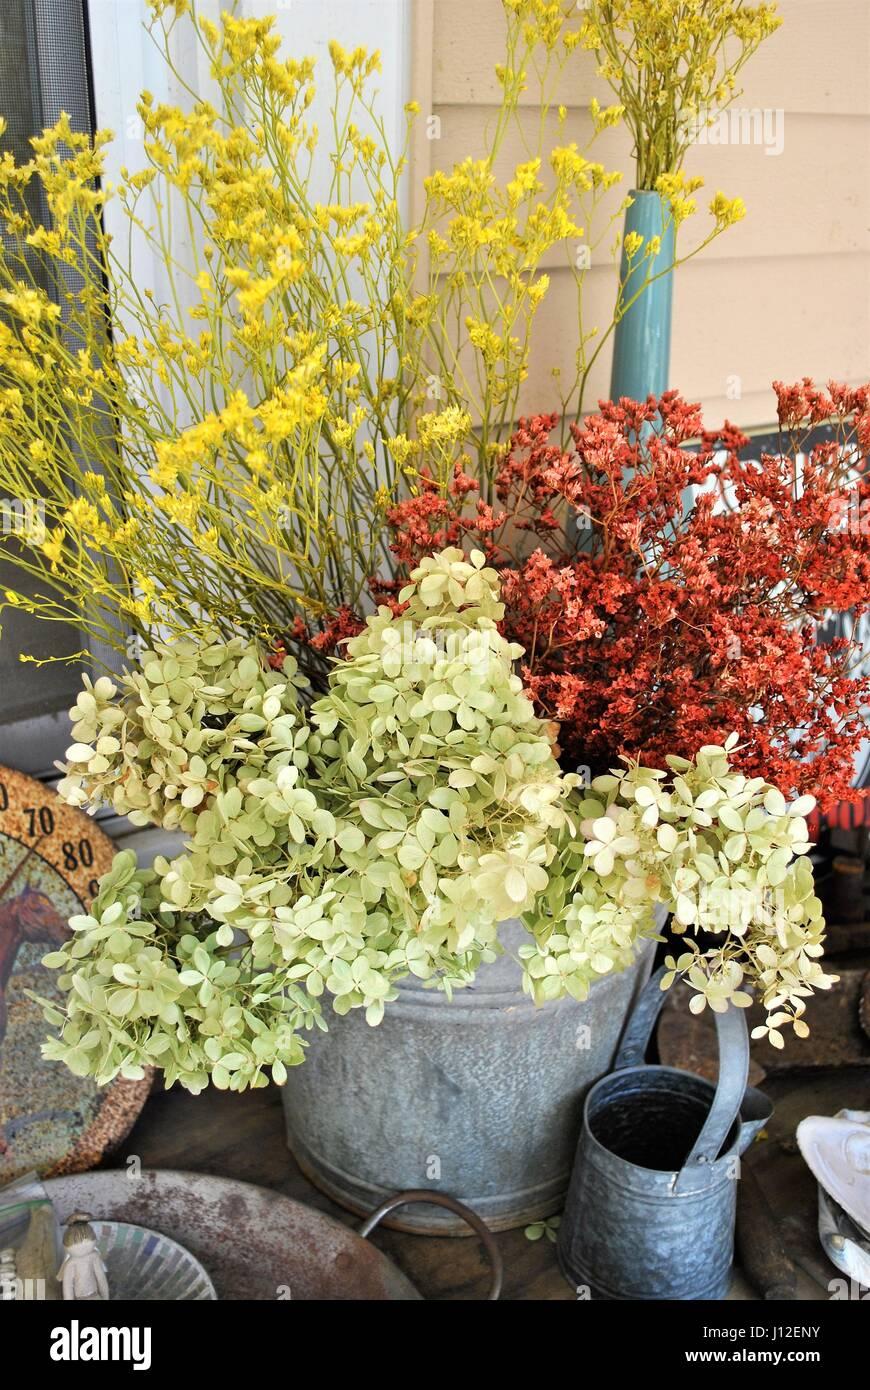 Dried Flowers In Metal Bucket Stock Photo Alamy